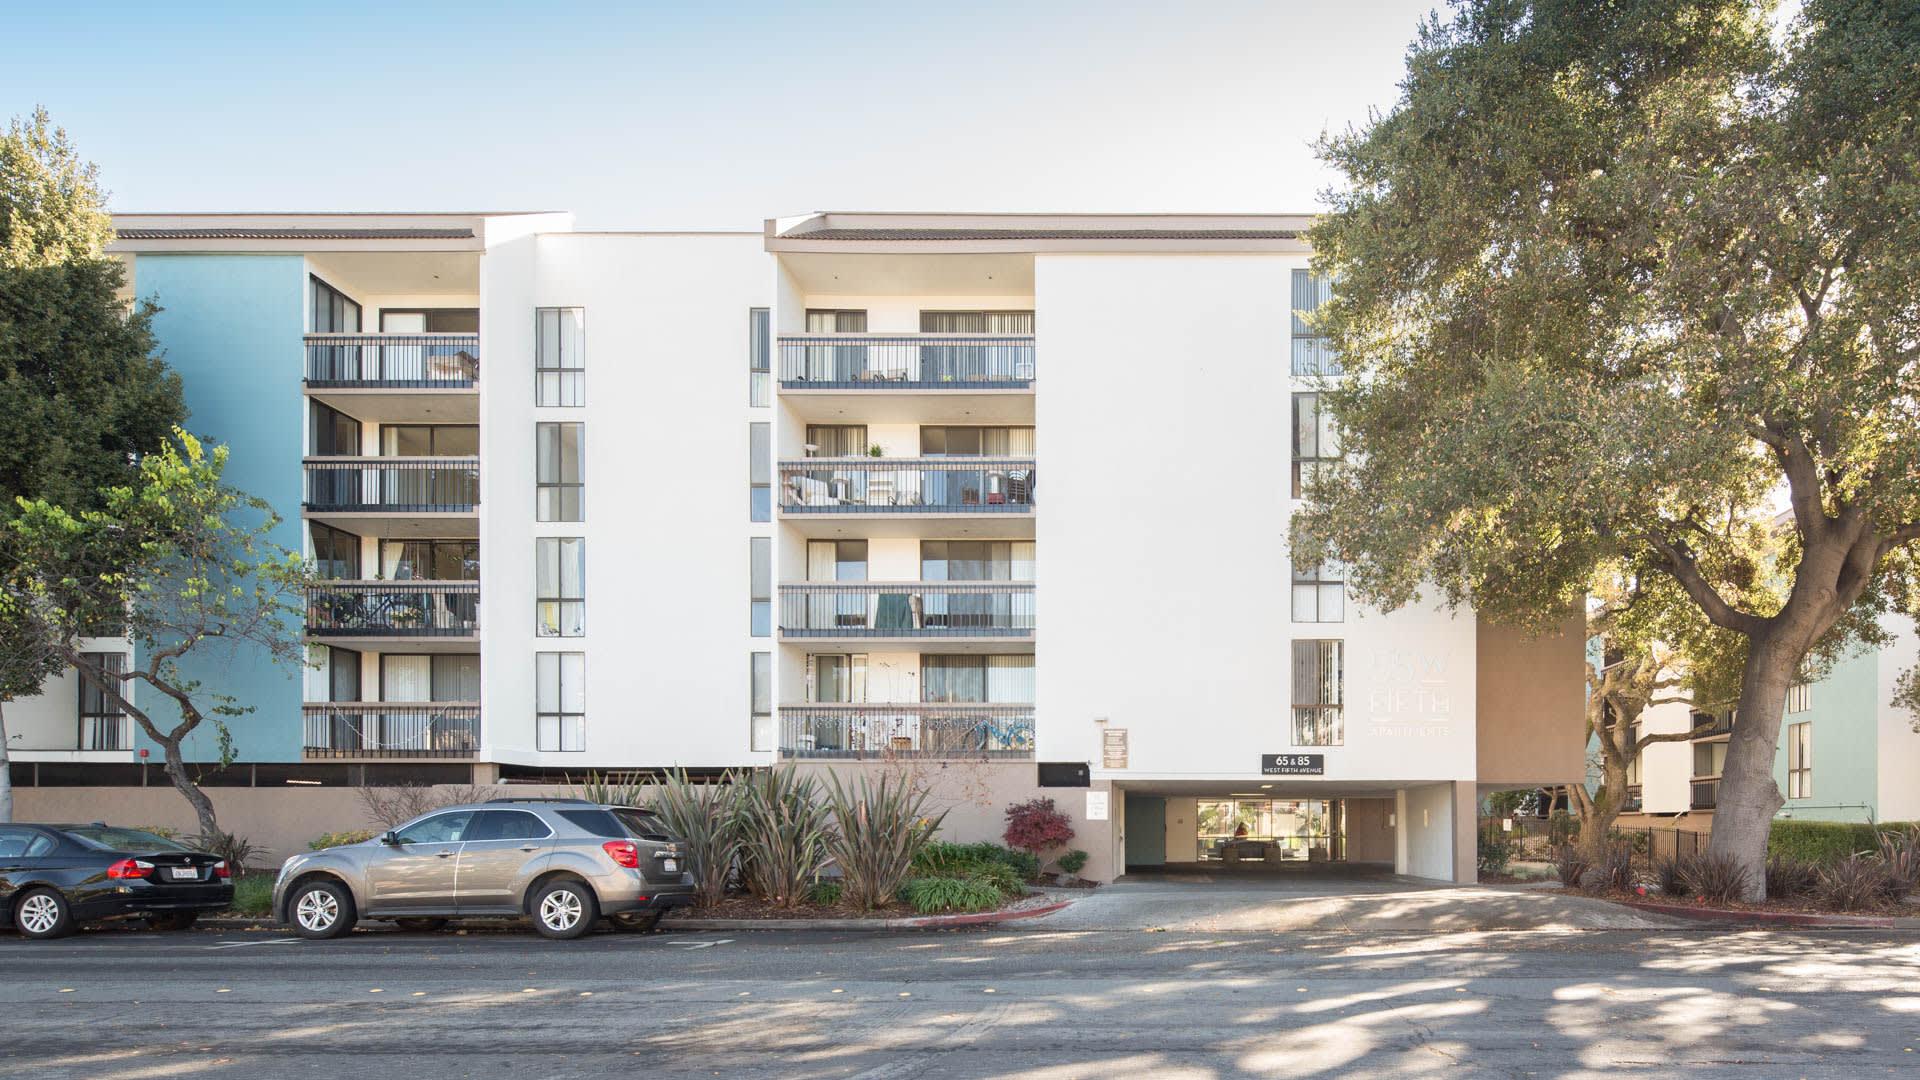 55 West Fifth Apartments - Garden Building Exterior